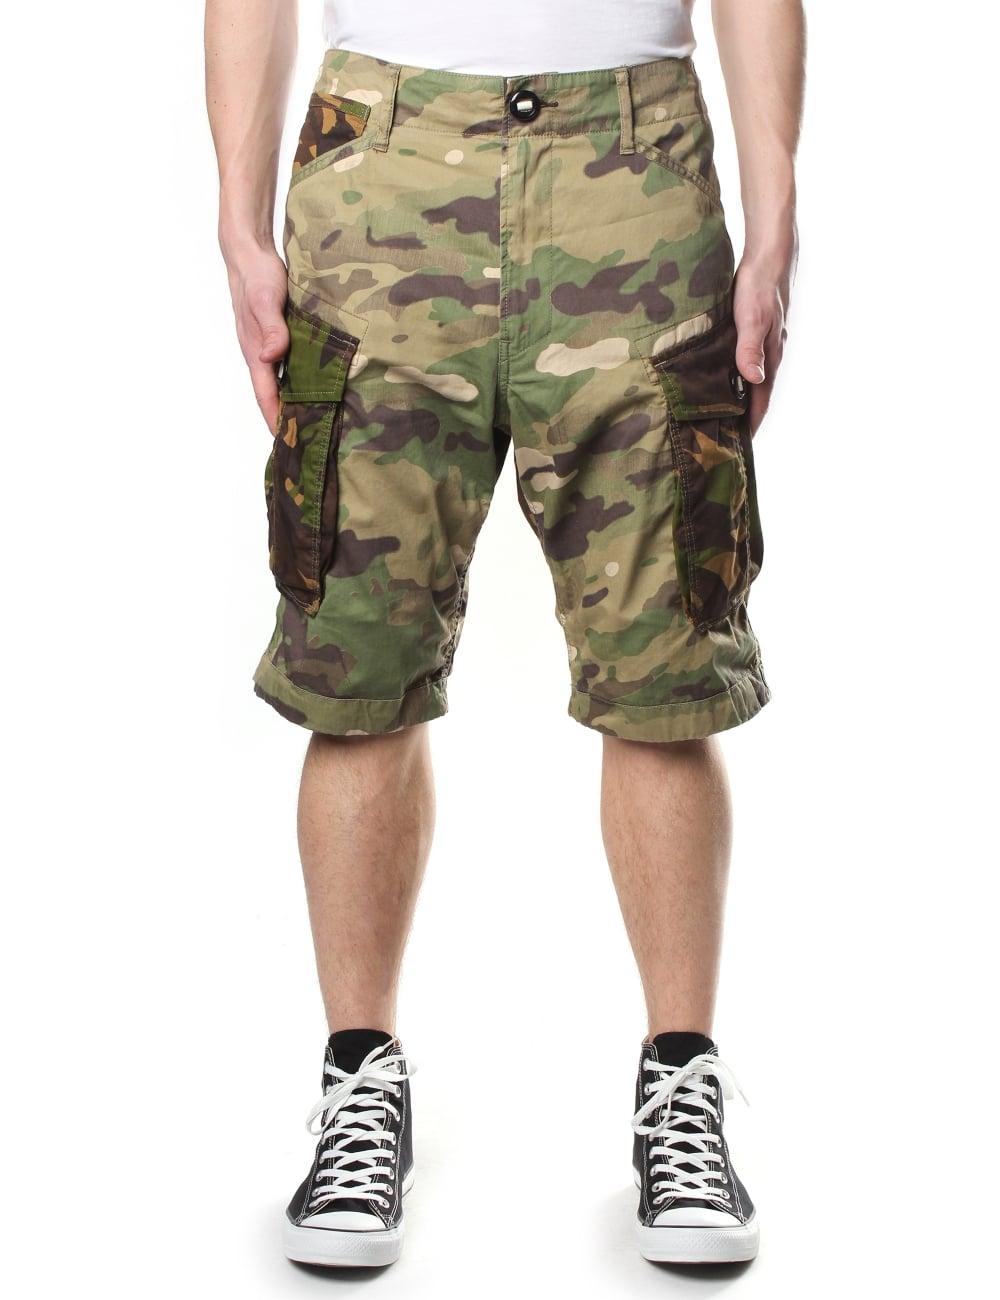 Topmoderne G-Star Raw Men's Rovic Loose 1/2 Length Premium Twill Shorts OT-51